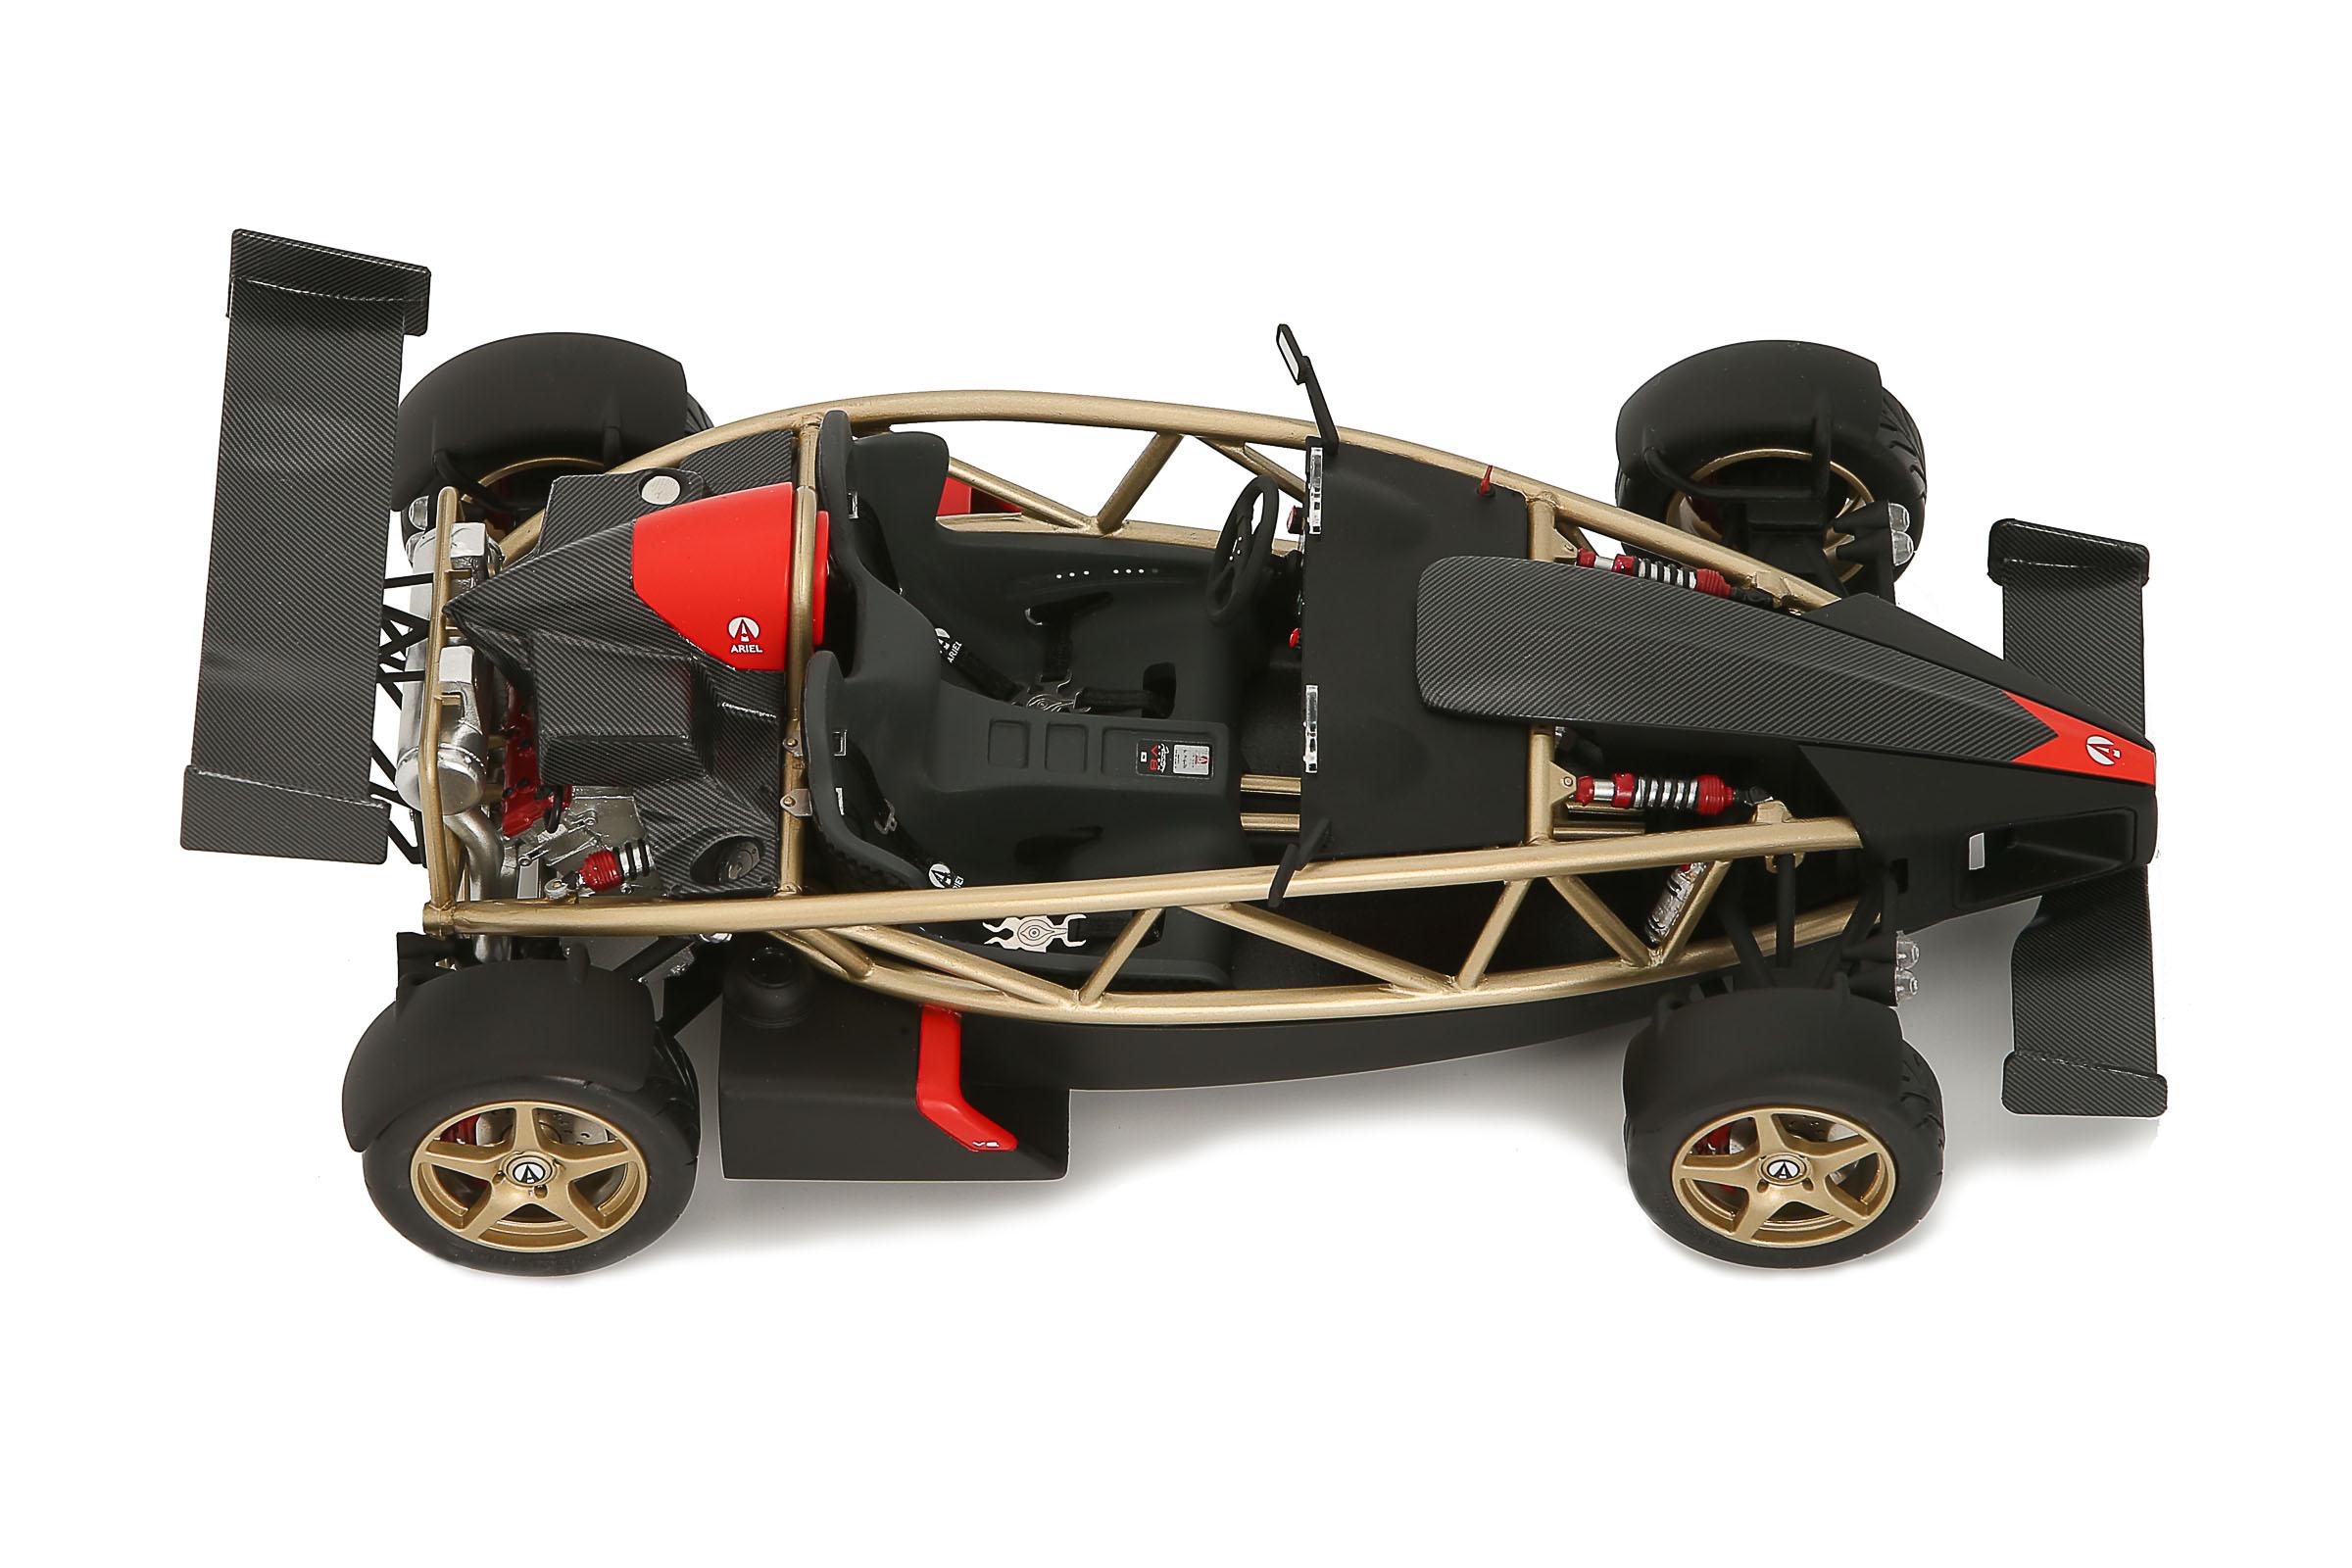 Ariel_Atom_V8_Model_Car_007.jpg